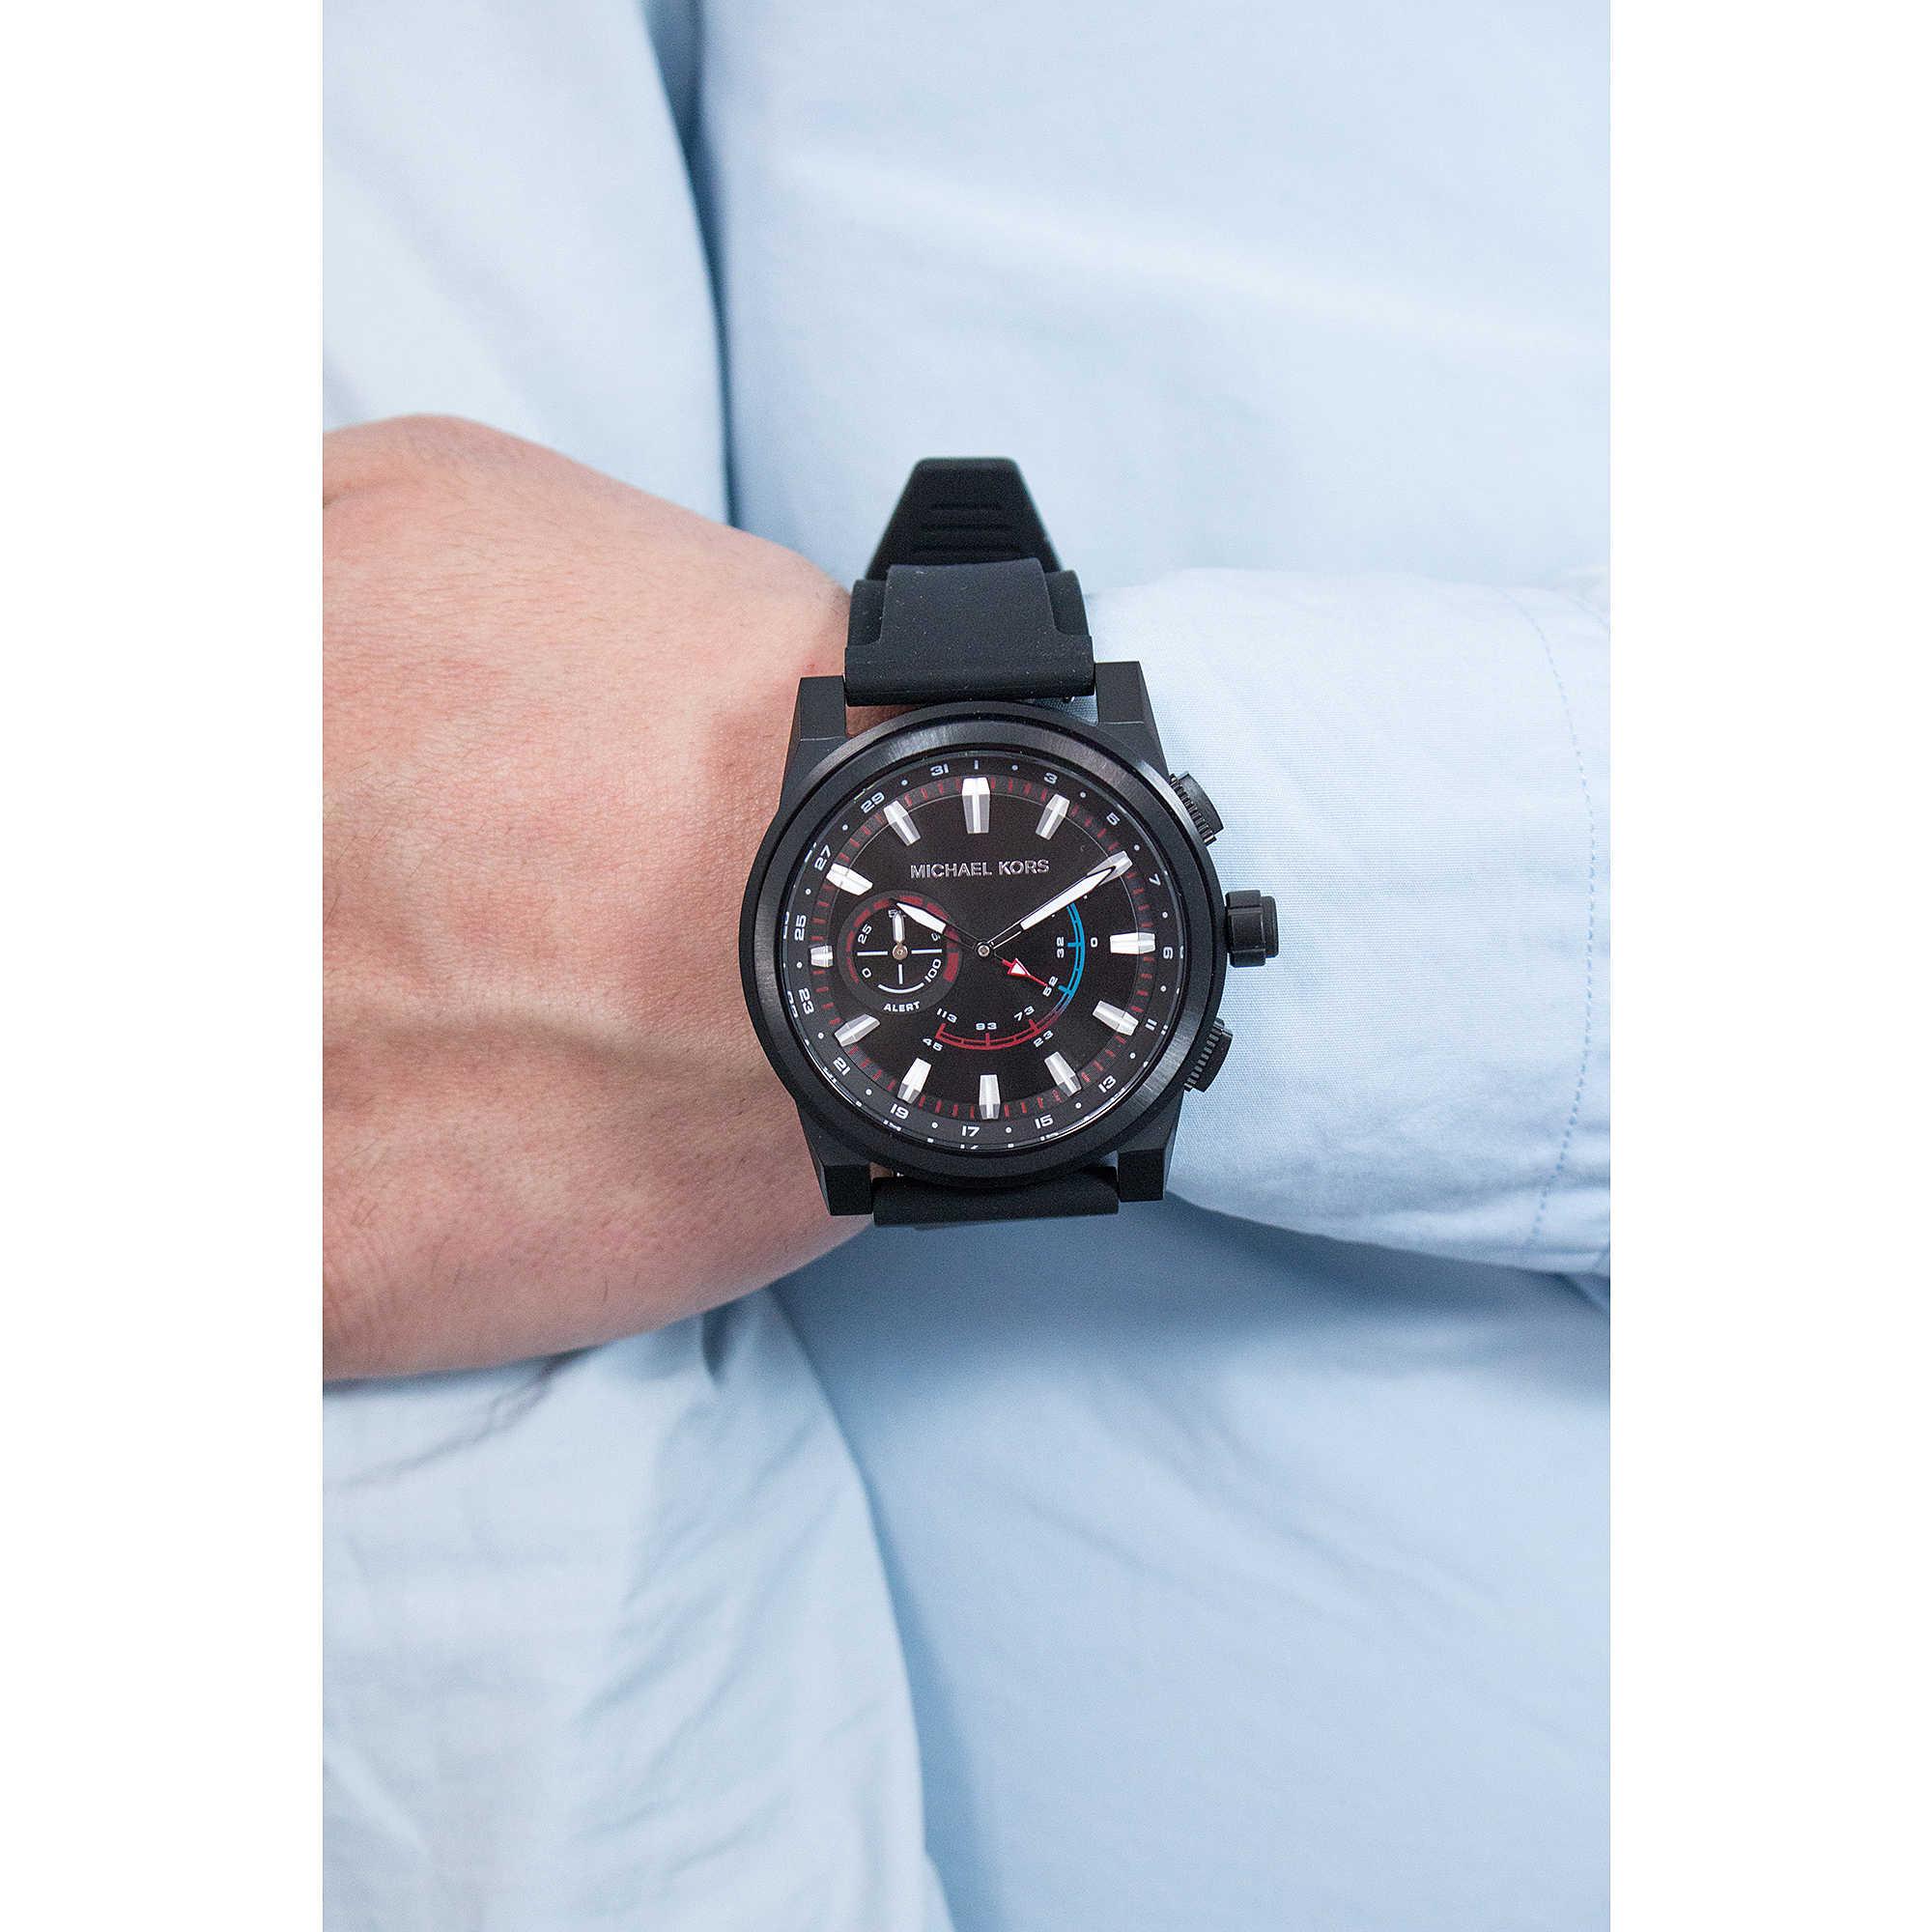 9988150bfe83 watch Smartwatch man Michael Kors Grayson MKT4010 Smartwatches ...